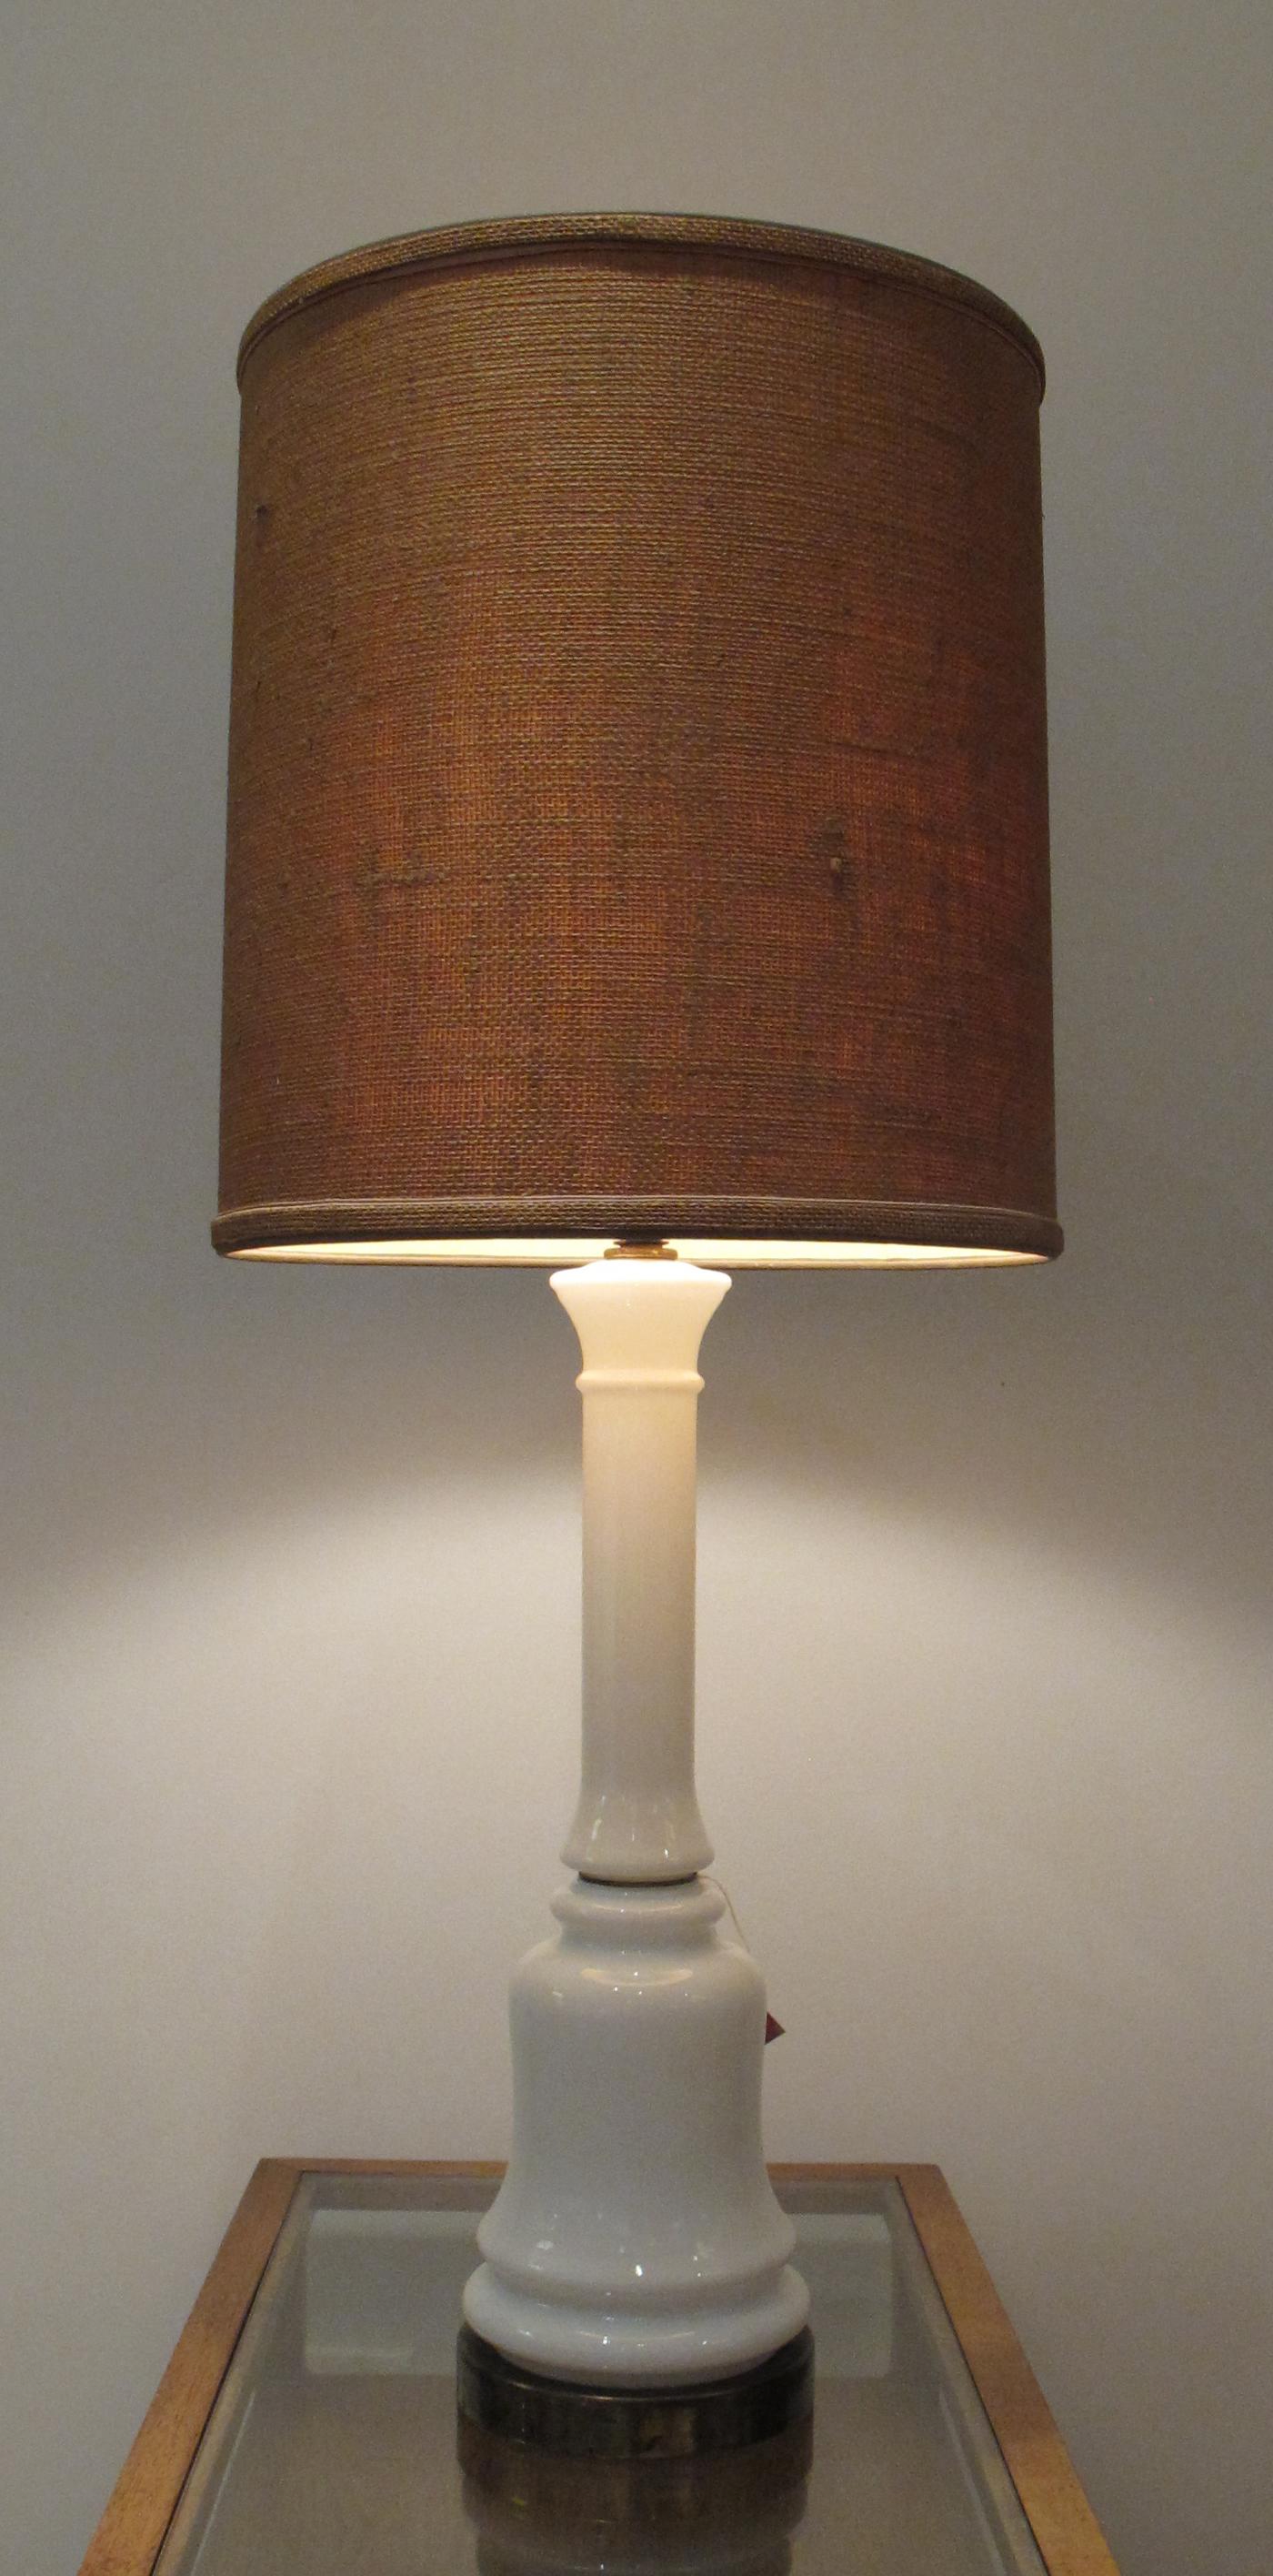 MID CENTURY WHITE GLASS & BRASS LAMP WITH BURLAP SHADE